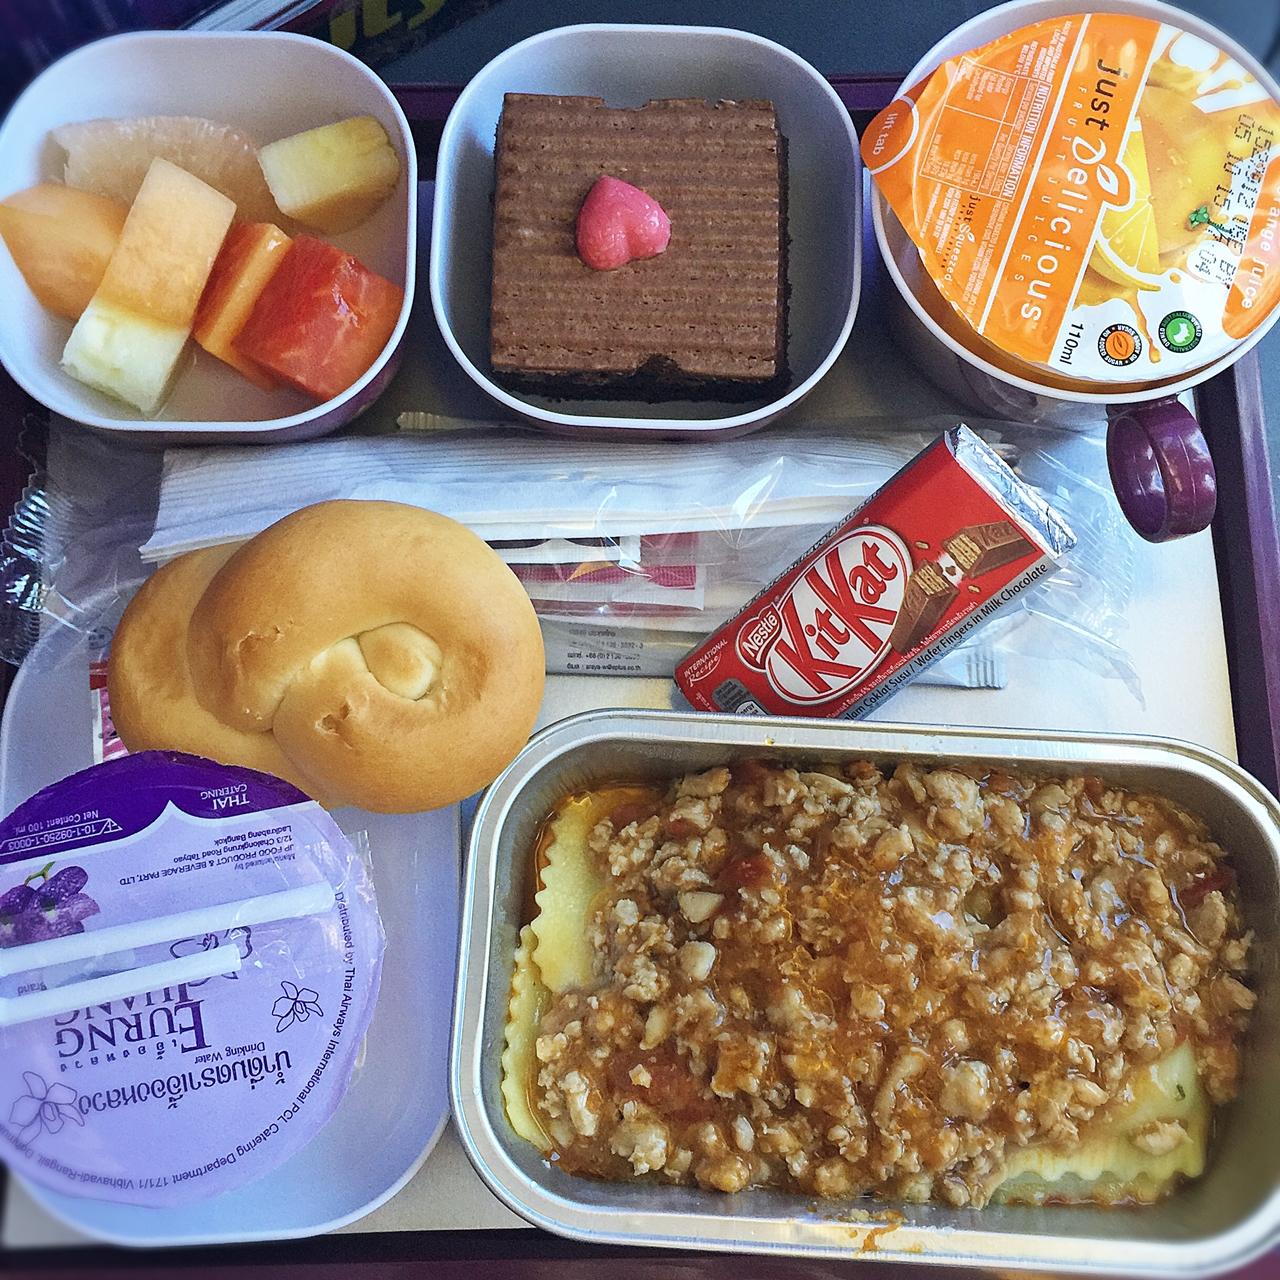 Flights singapore to bangkok thai airways ltt thai airways in flight menu child meal 22 cuisine paradise singapore food blog recipes forumfinder Gallery